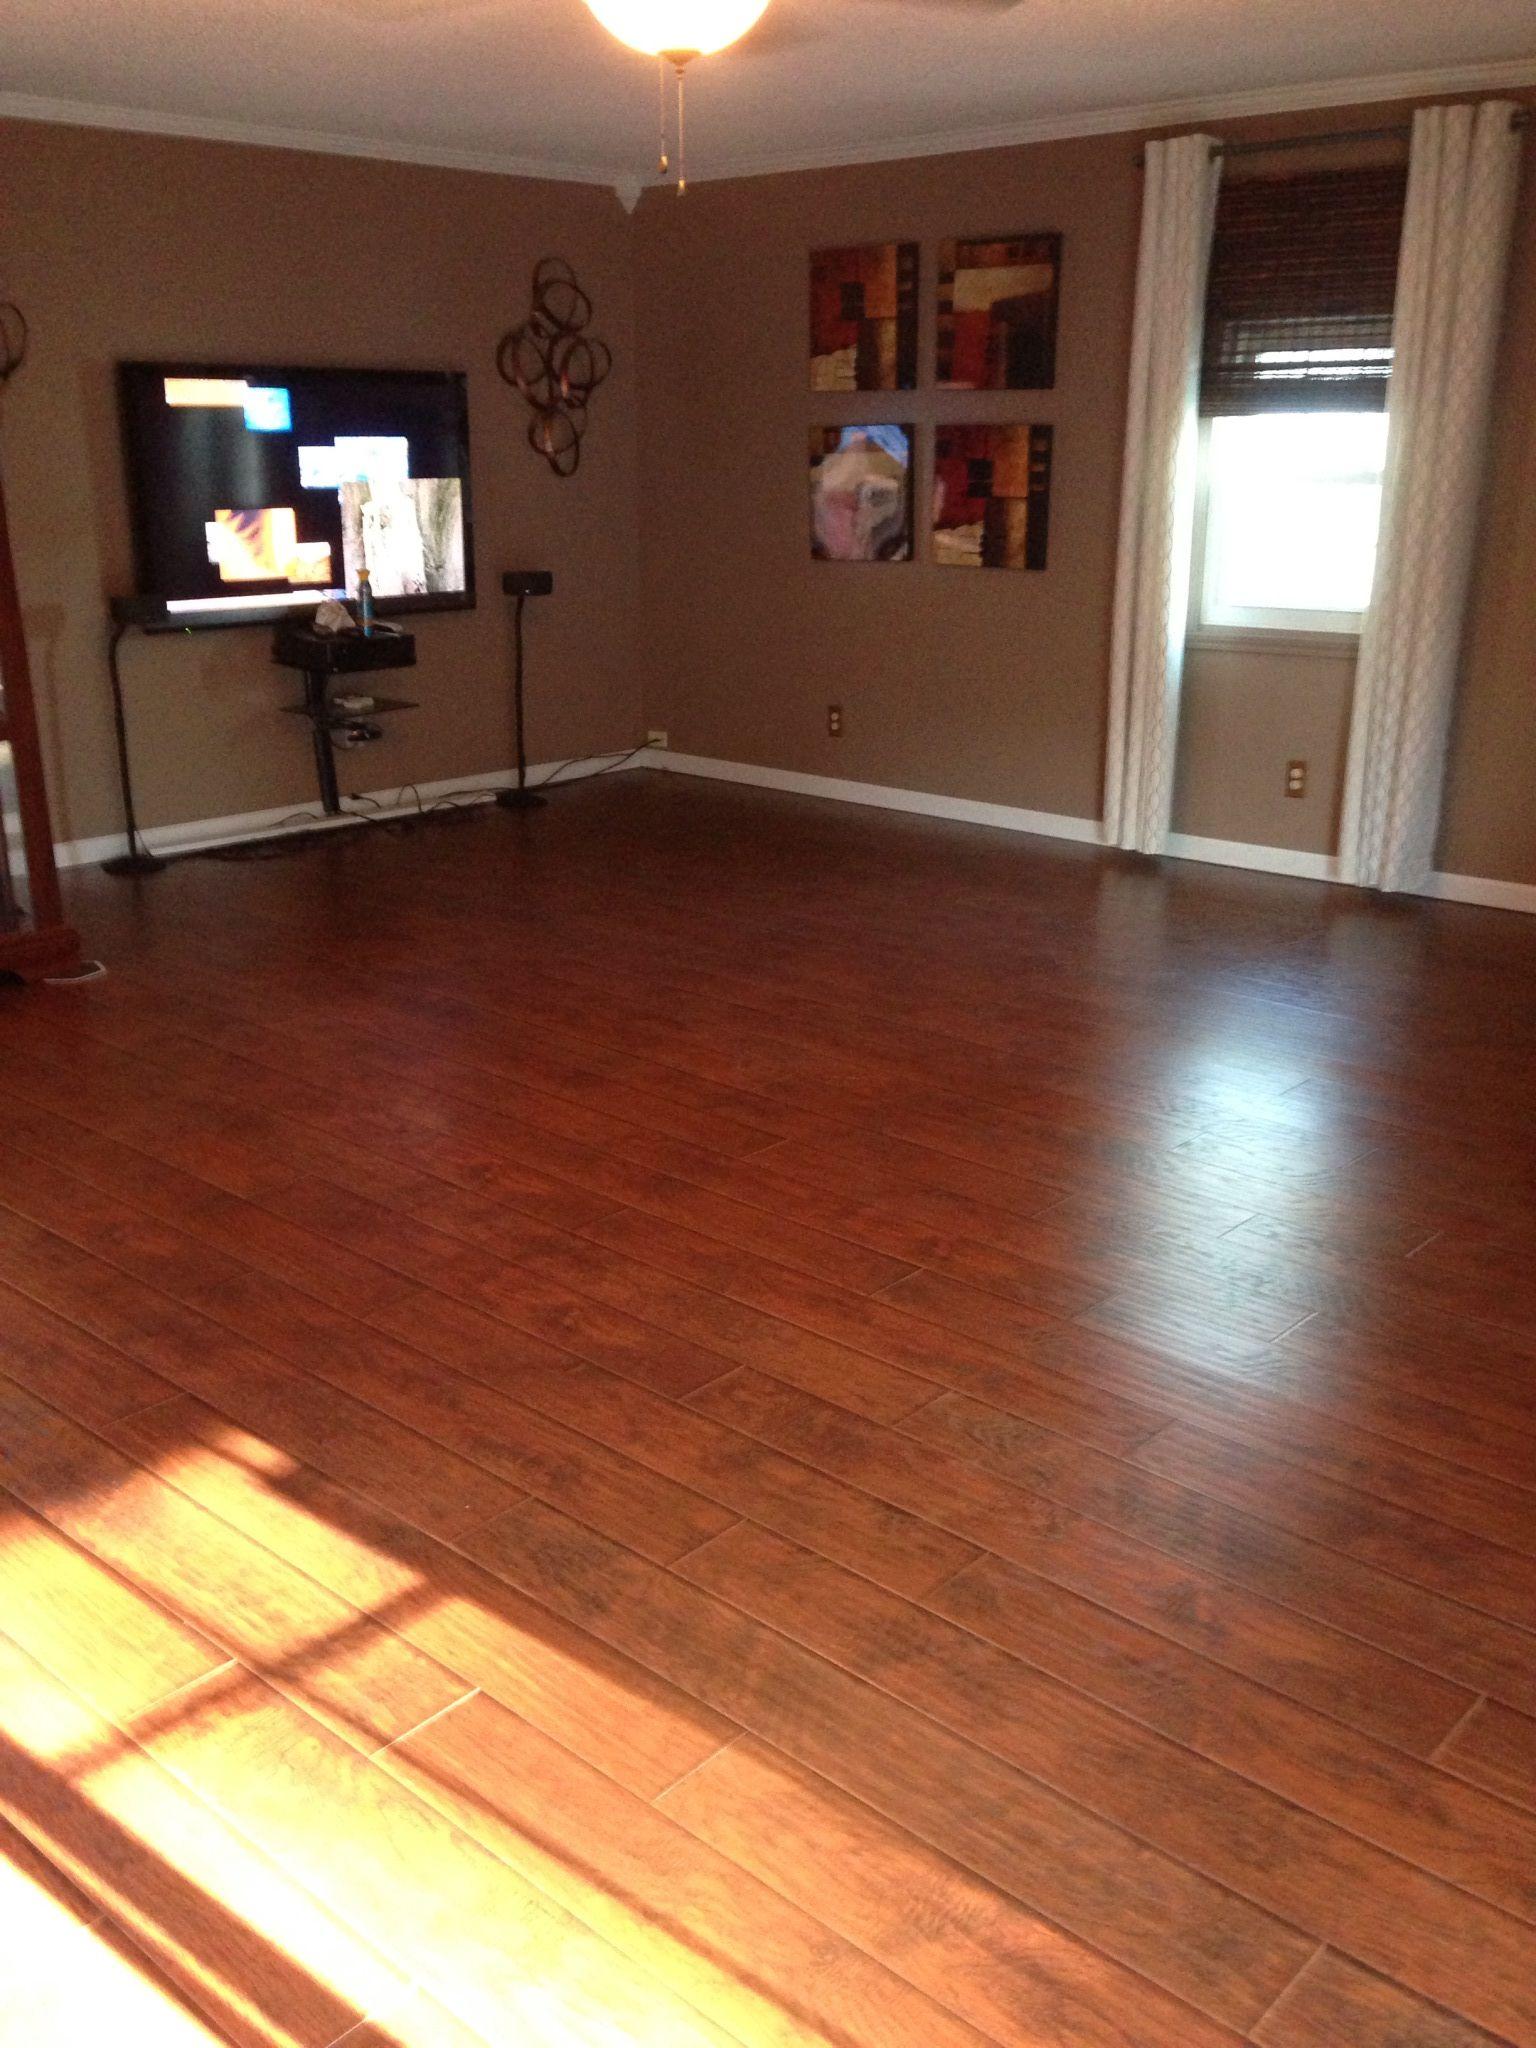 Select Surfaces Laminate Flooring (Canyon Oak) from Sam's